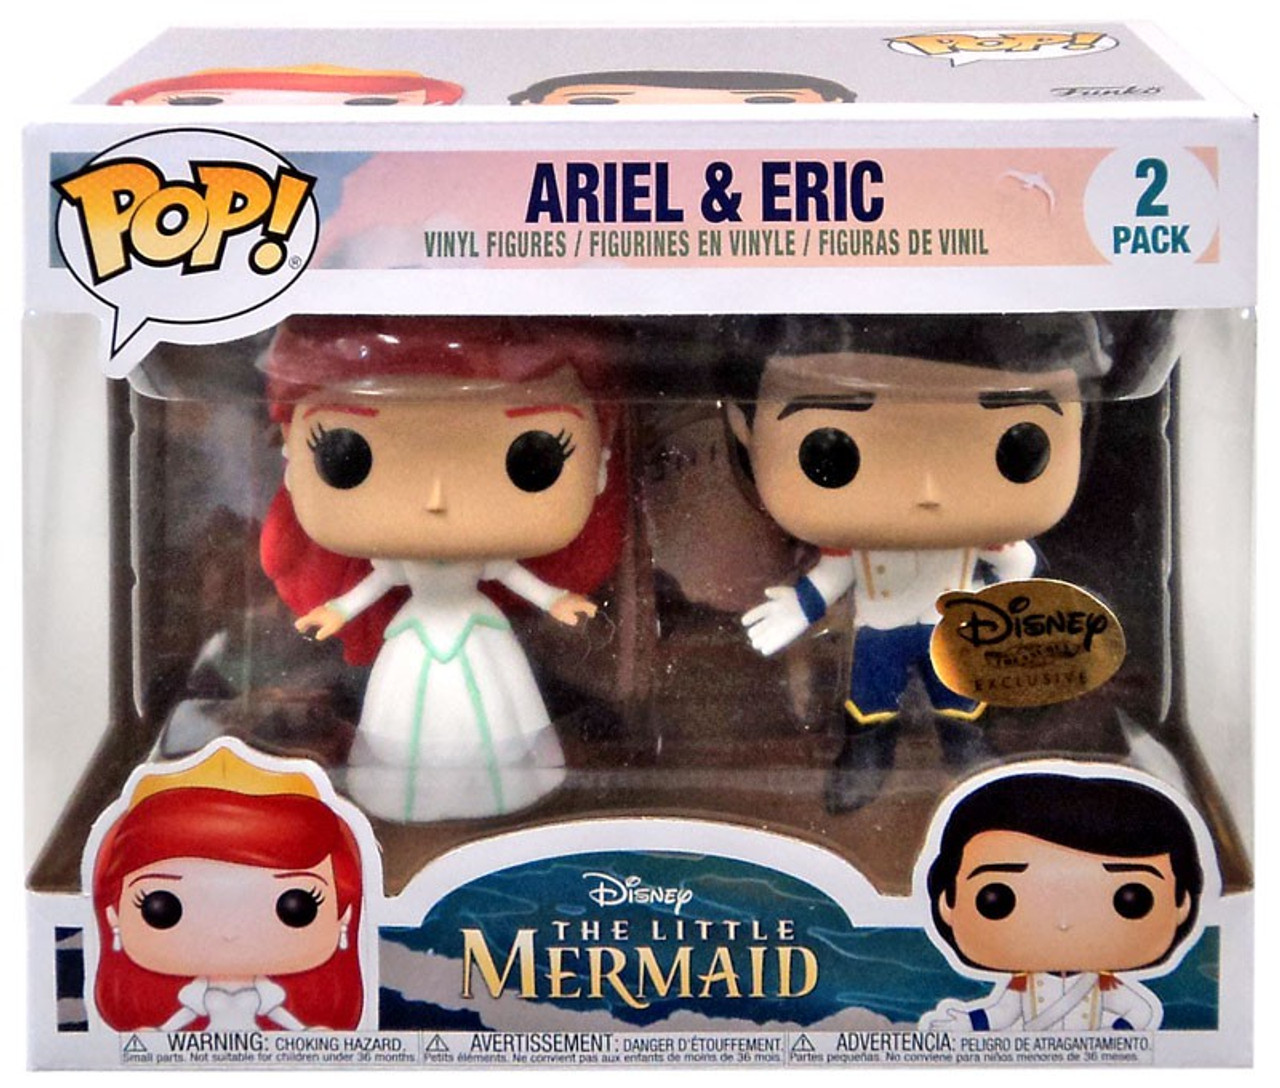 ariel and eric. Disney Ariel  Eric Exclusive Vinyl Figure 2 Pack Funko The Little Mermaid POP